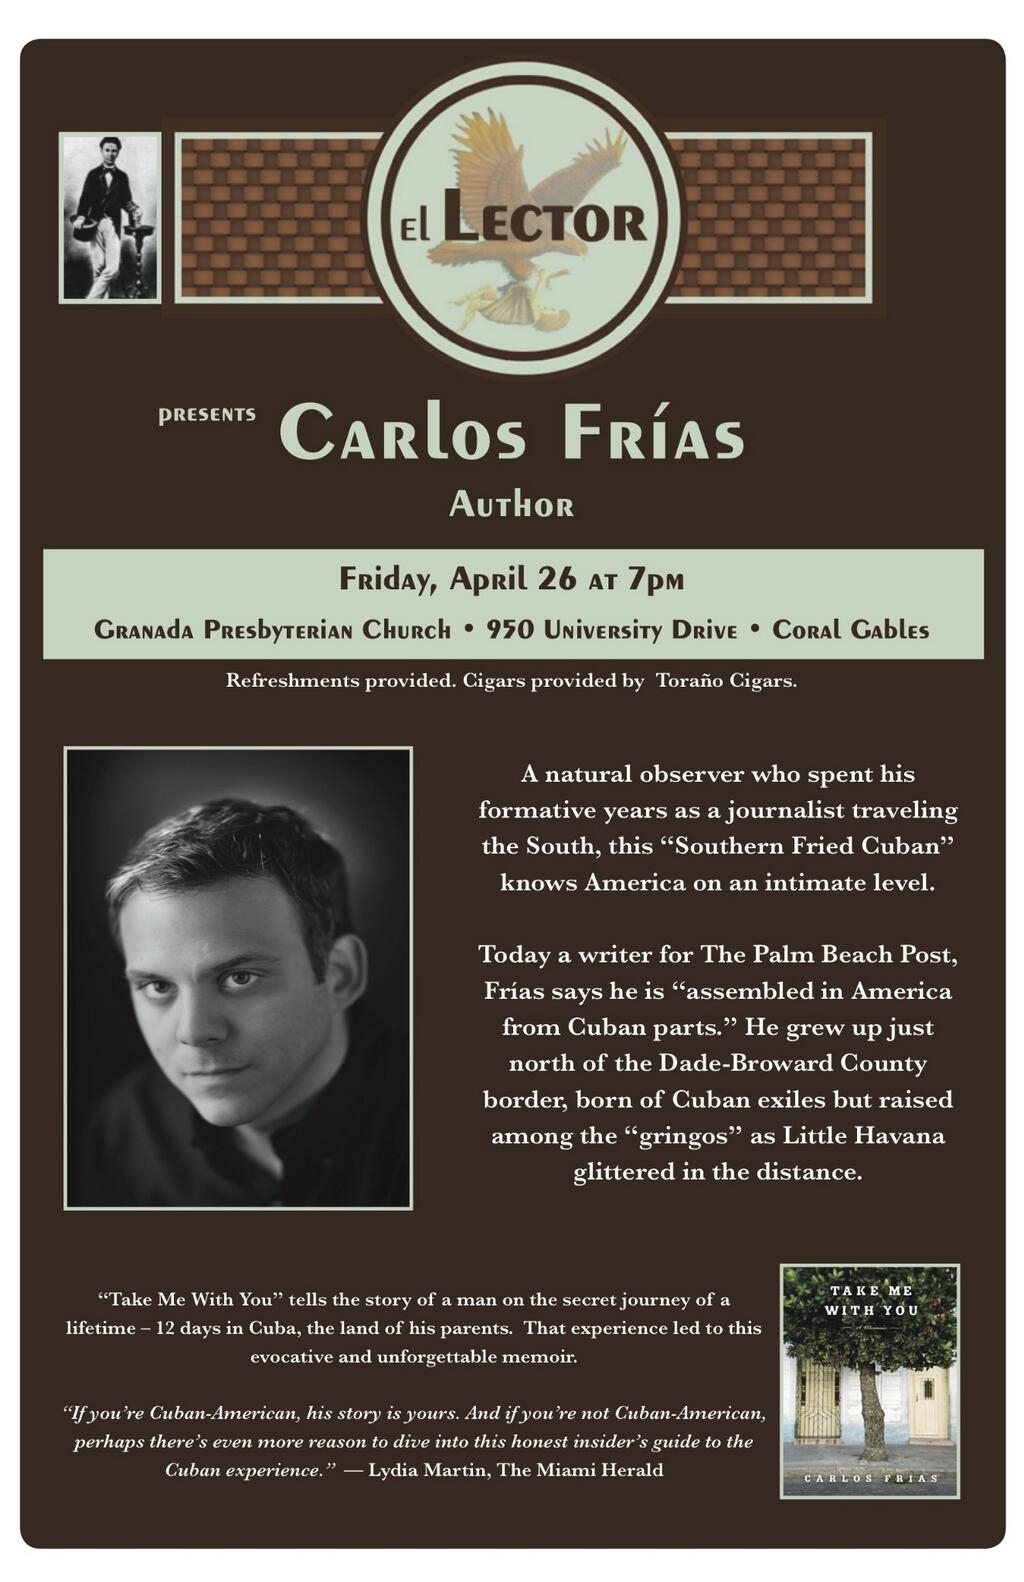 http://2.bp.blogspot.com/-Ds92oPRORtU/UXXGUZwaDlI/AAAAAAAAA5w/Rc1f5p56zbI/s1600/Carlos+Frias+-+El+Lector.jpg